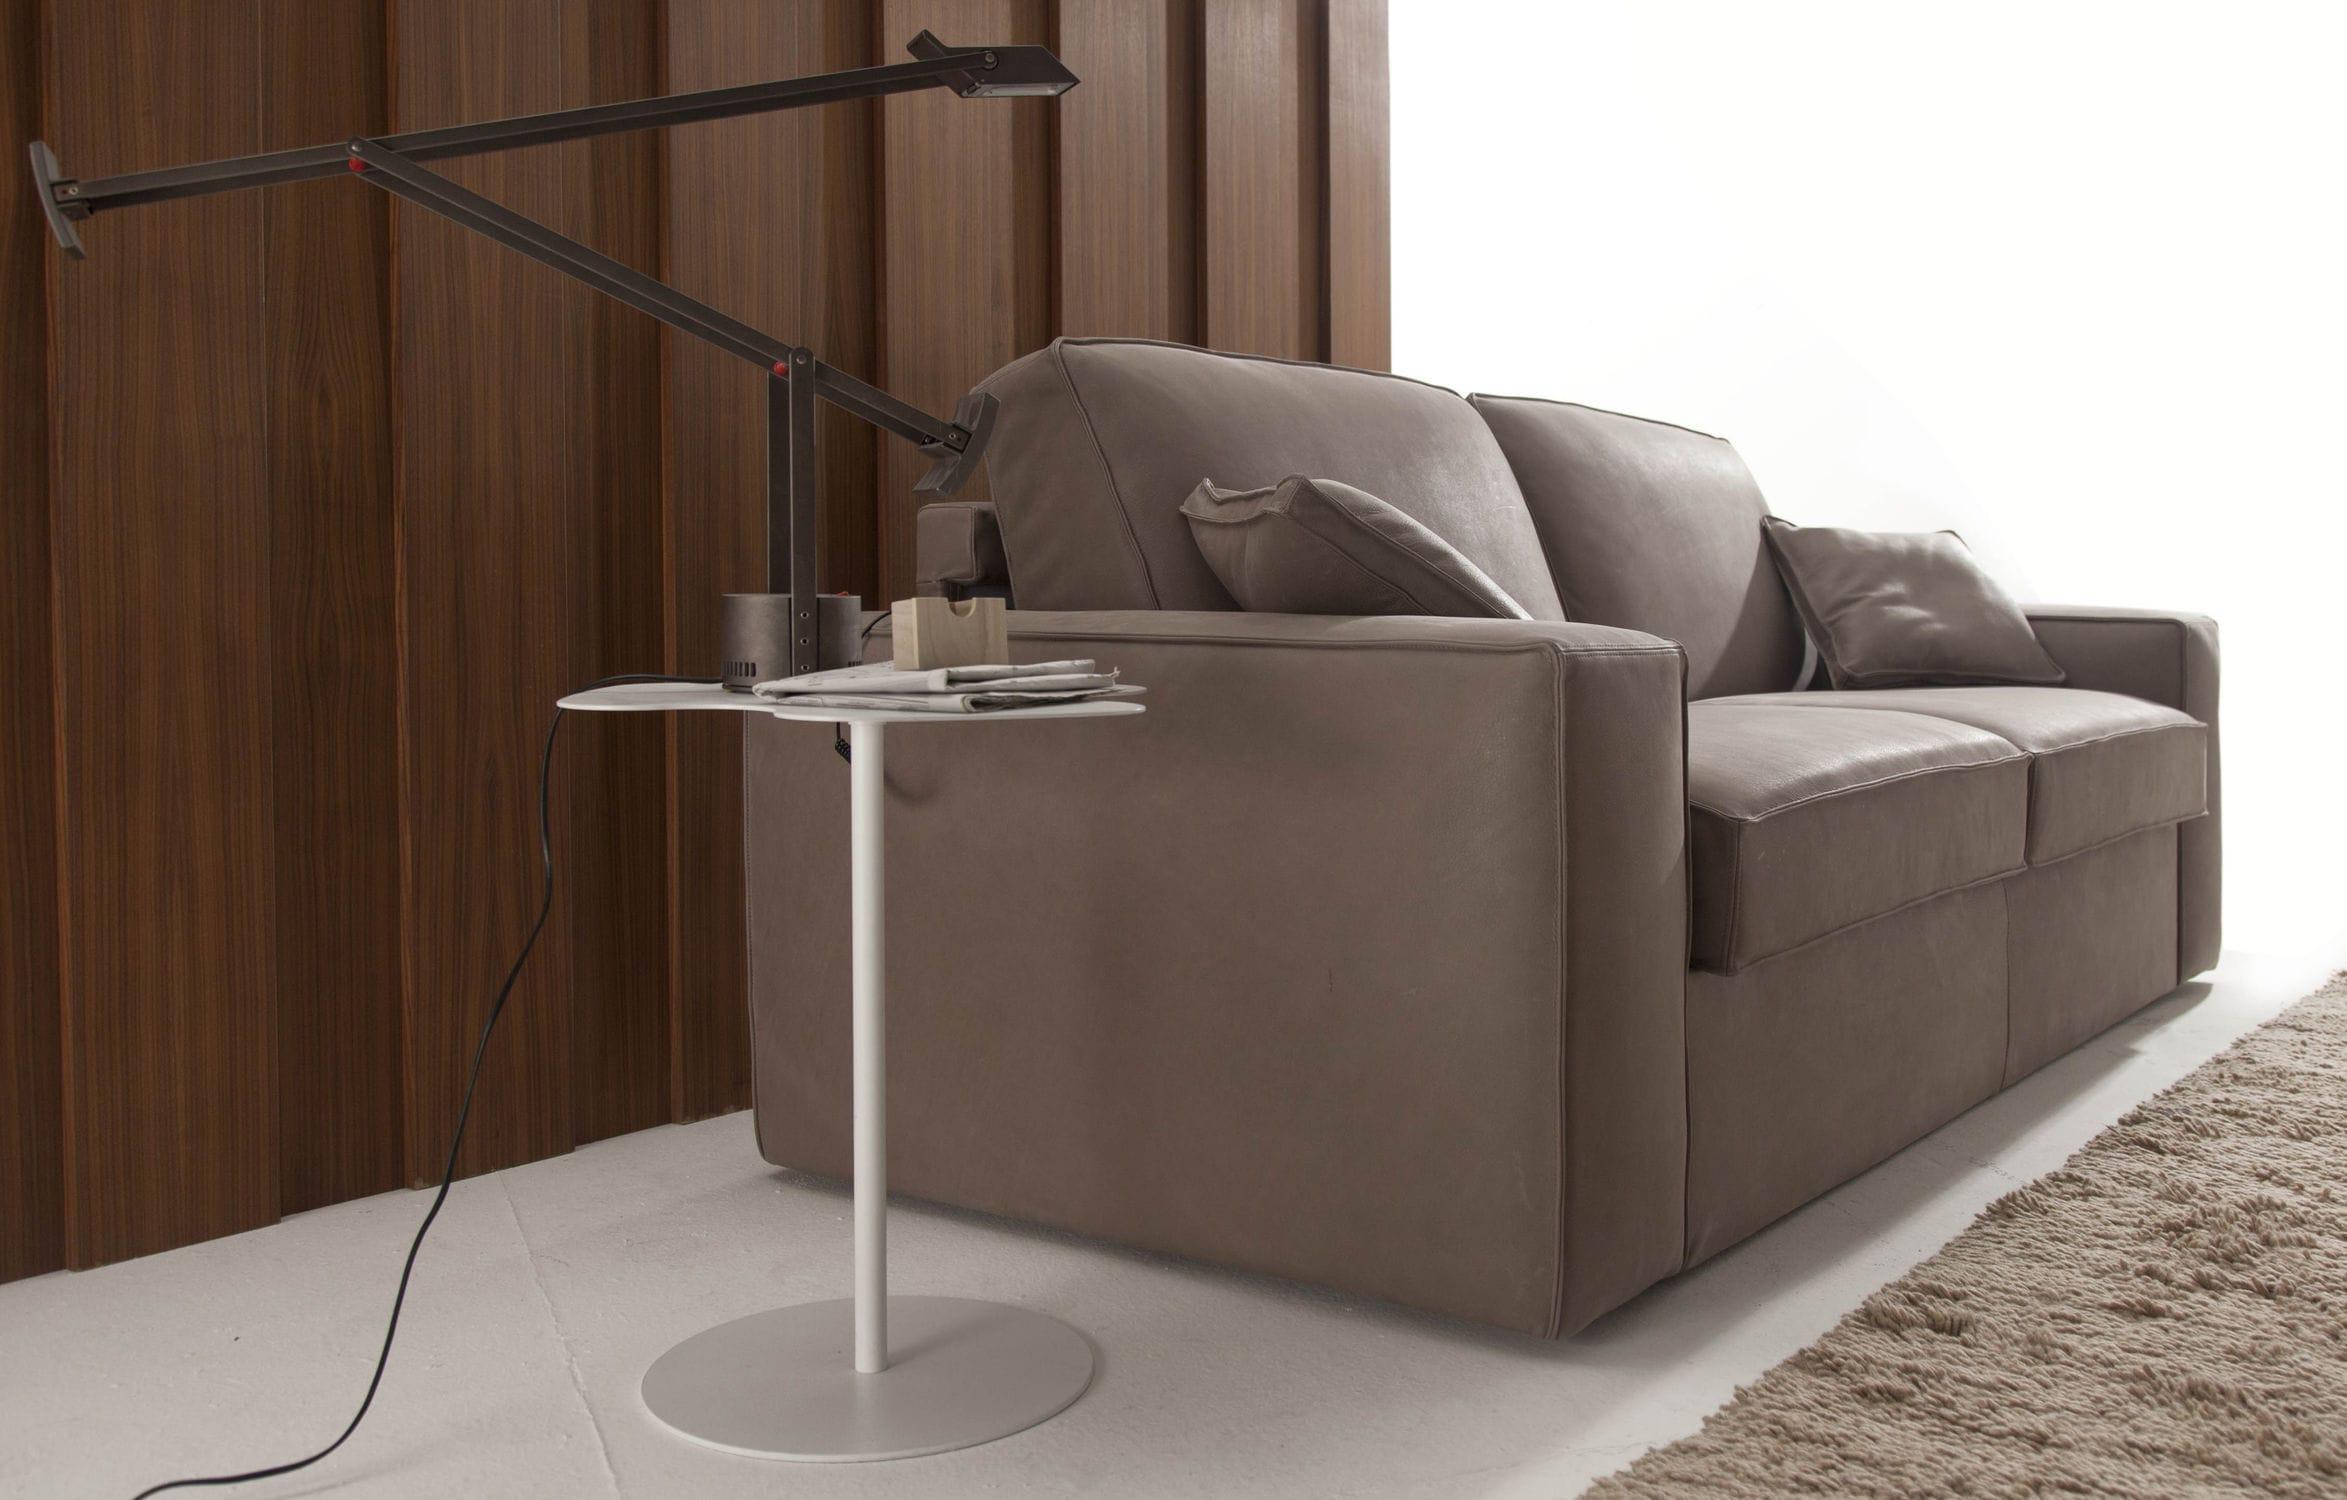 Fine Bettsofa Modern Samt Leder Eleven Automatic Sofa Bed Divani Santambrogio Caraccident5 Cool Chair Designs And Ideas Caraccident5Info